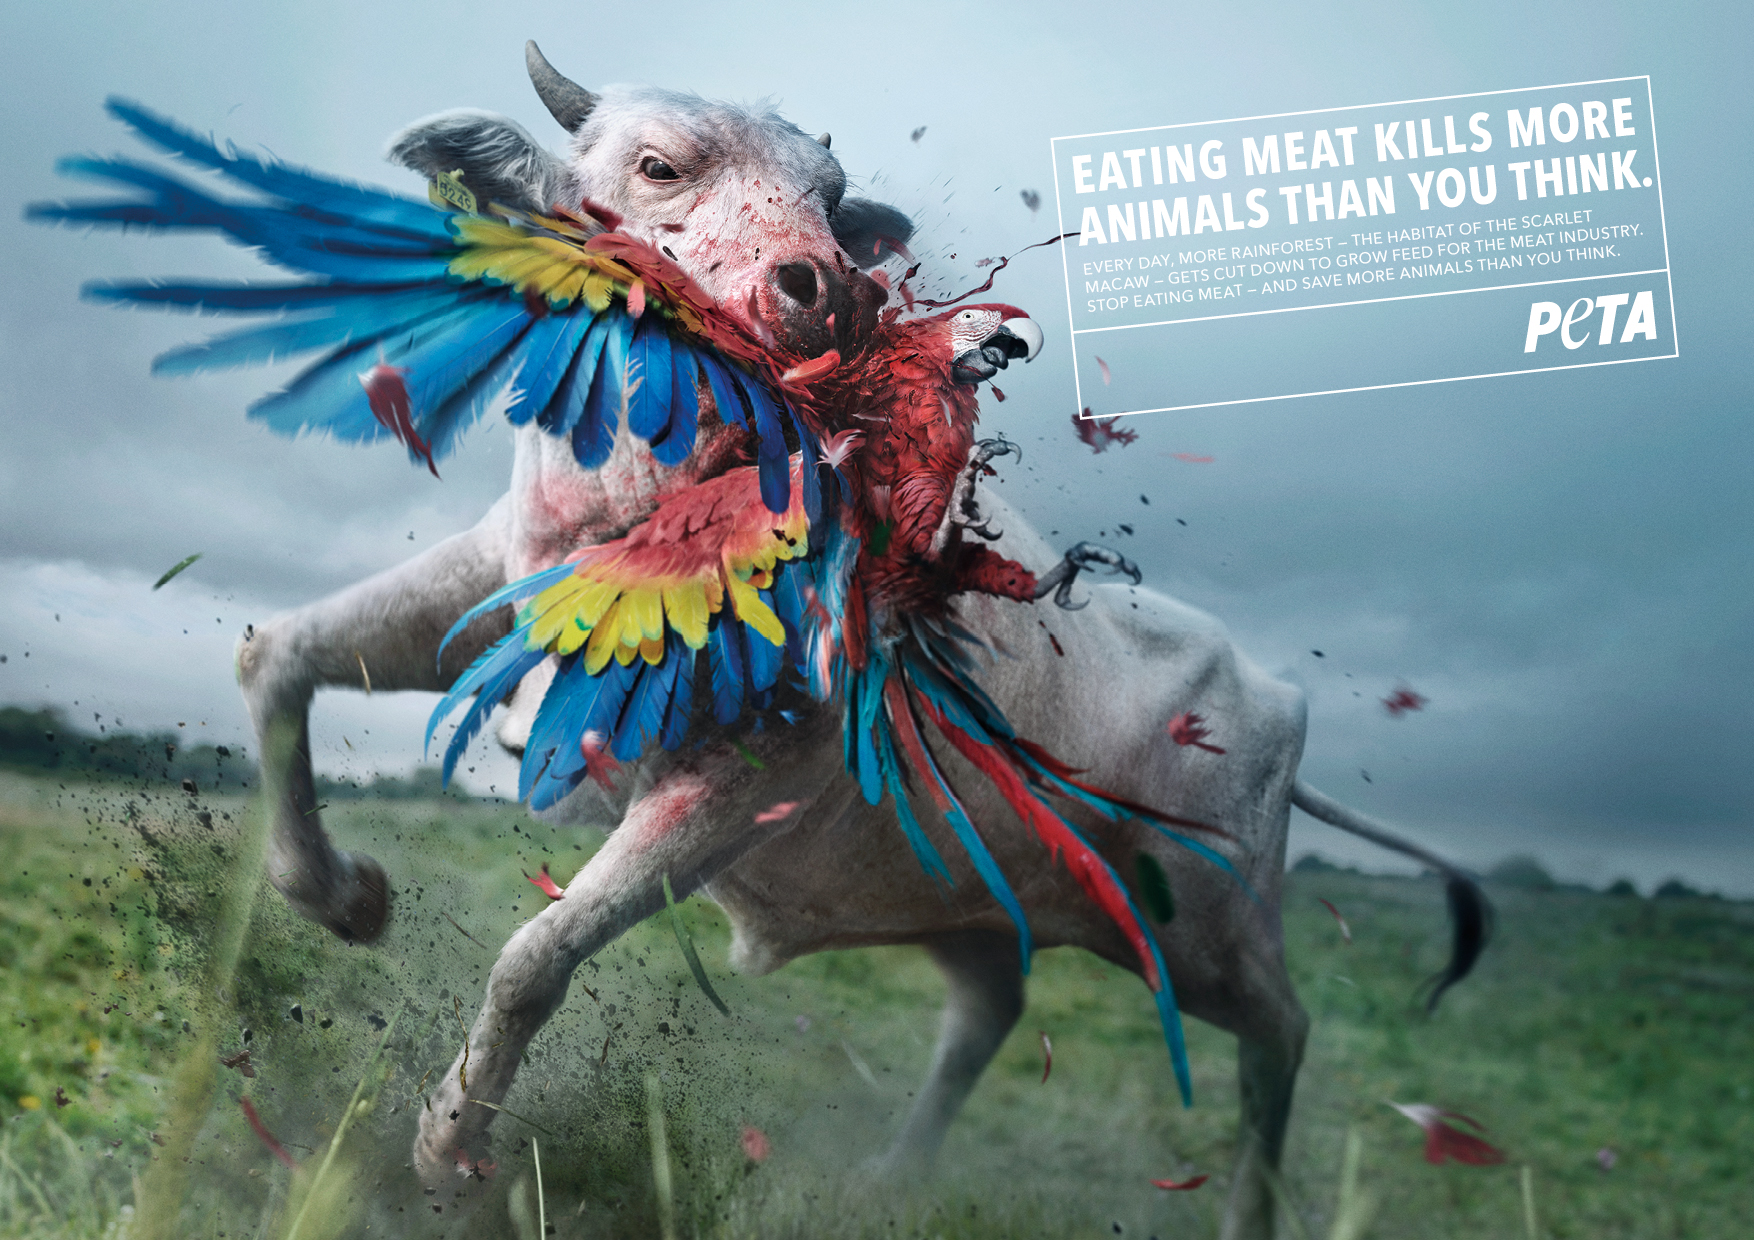 PETA_AZ_KillerCow_MACAW_210x297_EN_190123.jpg